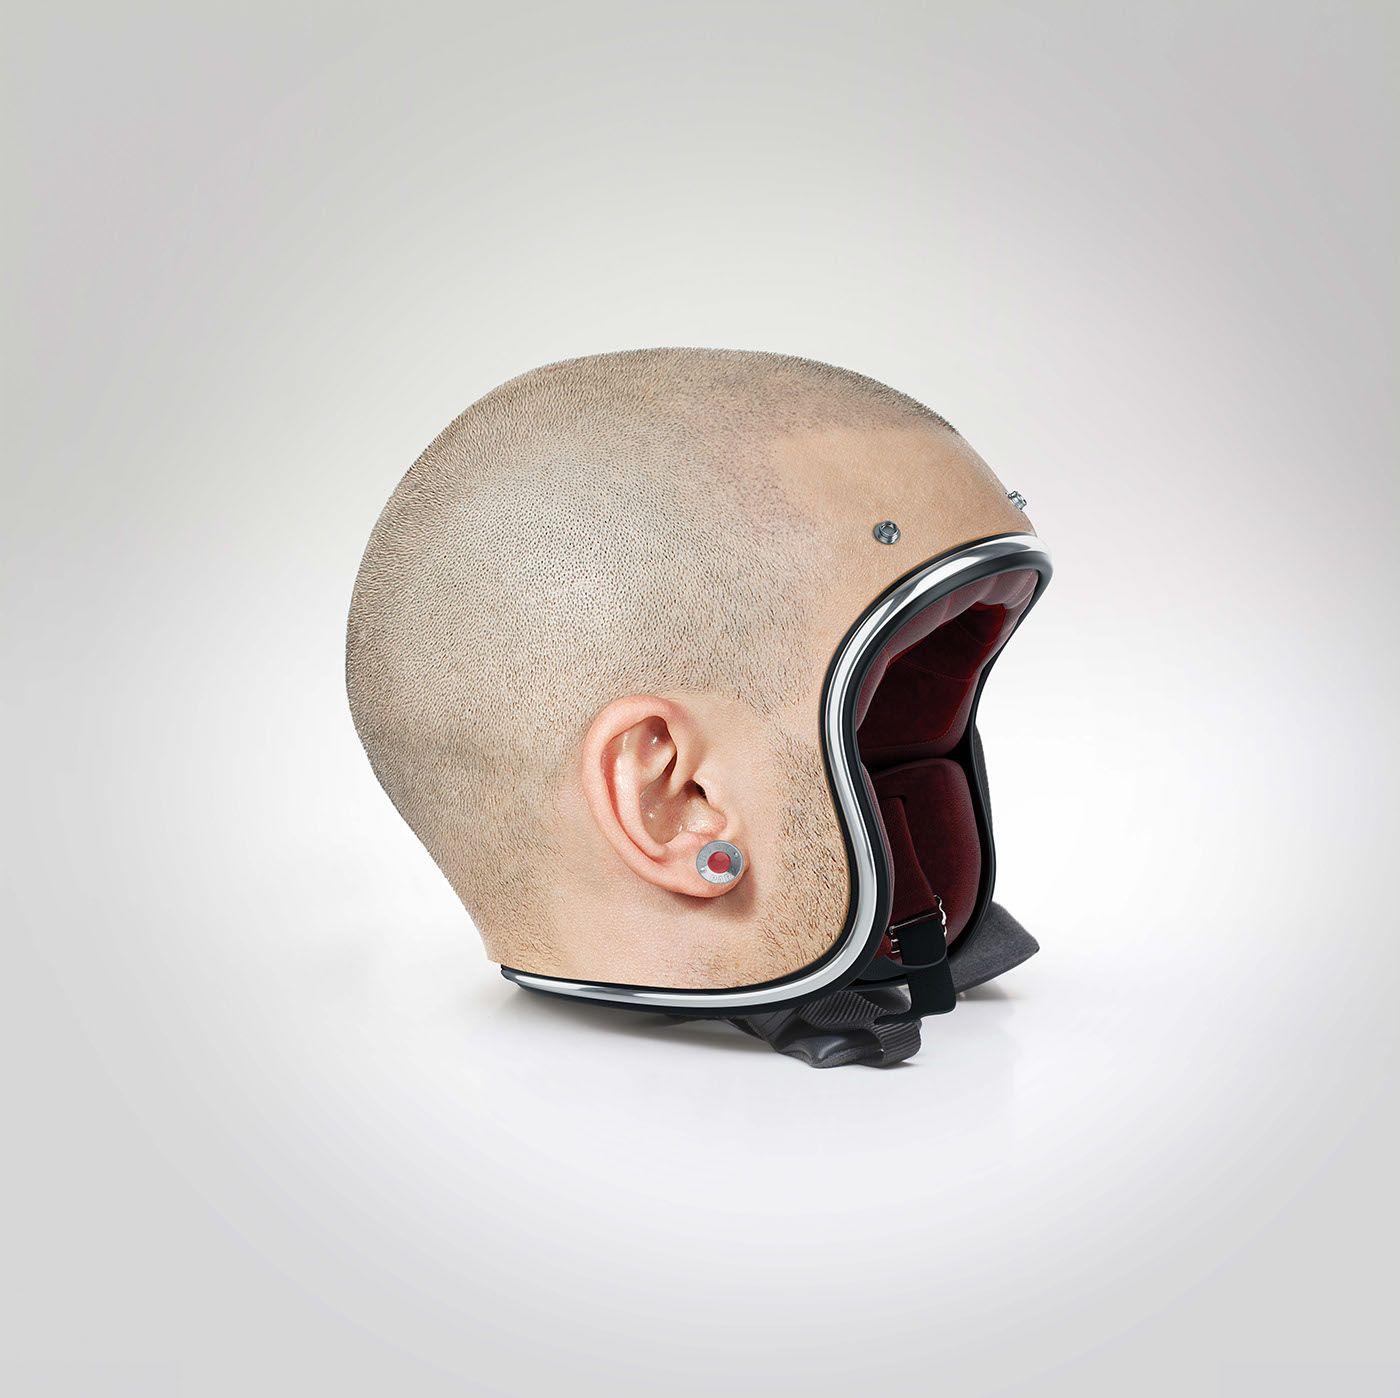 Creepy Helmets That Look Like Human Heads Suggest Flesh Is In